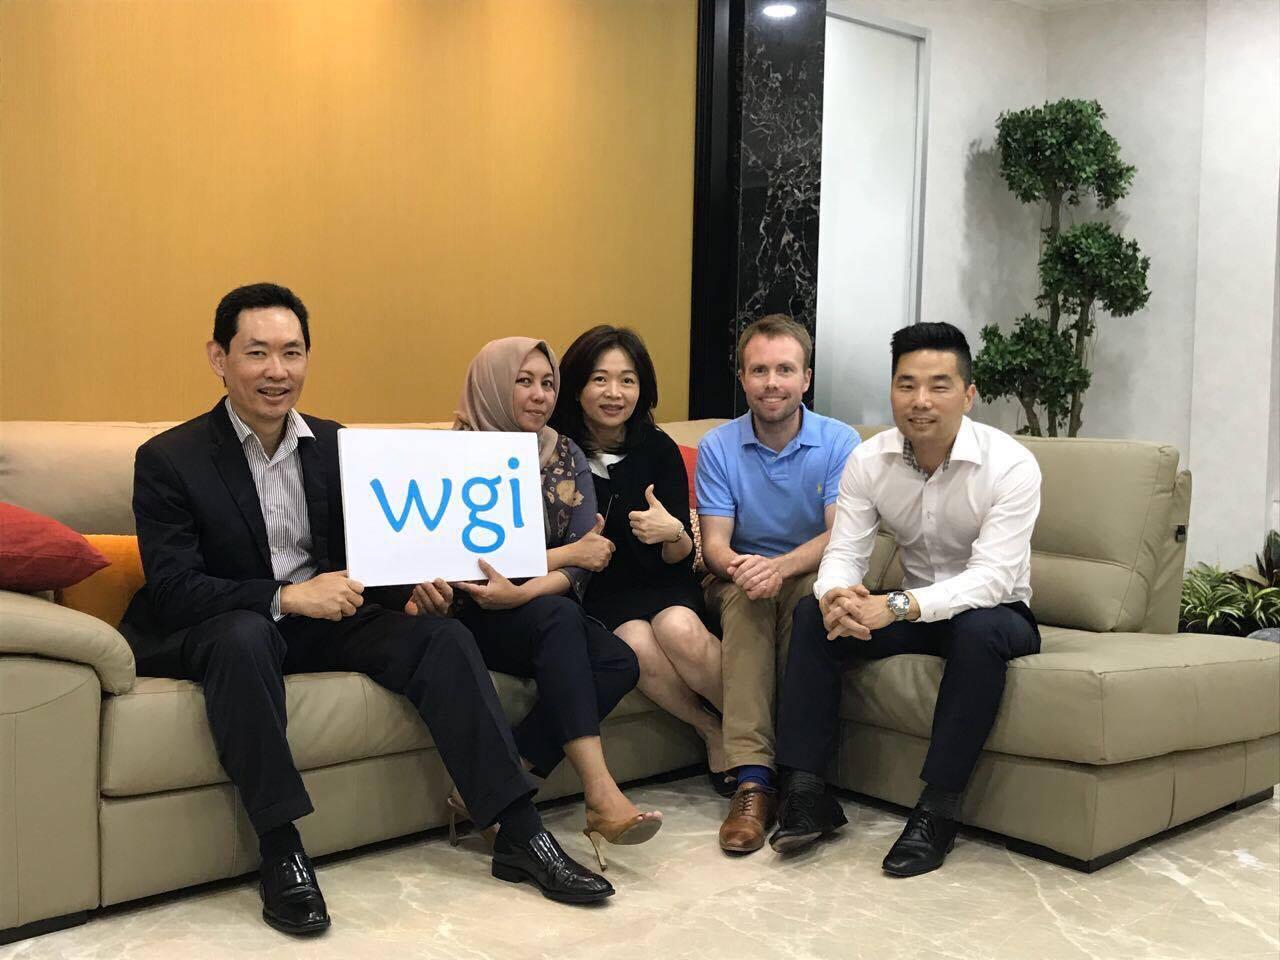 Founding Board of Directors of WGI Indonesia: Charles Yong, Anggiasari Hindratmo, Mina Ondang, Peter Haarmark, & Christoph Choi.